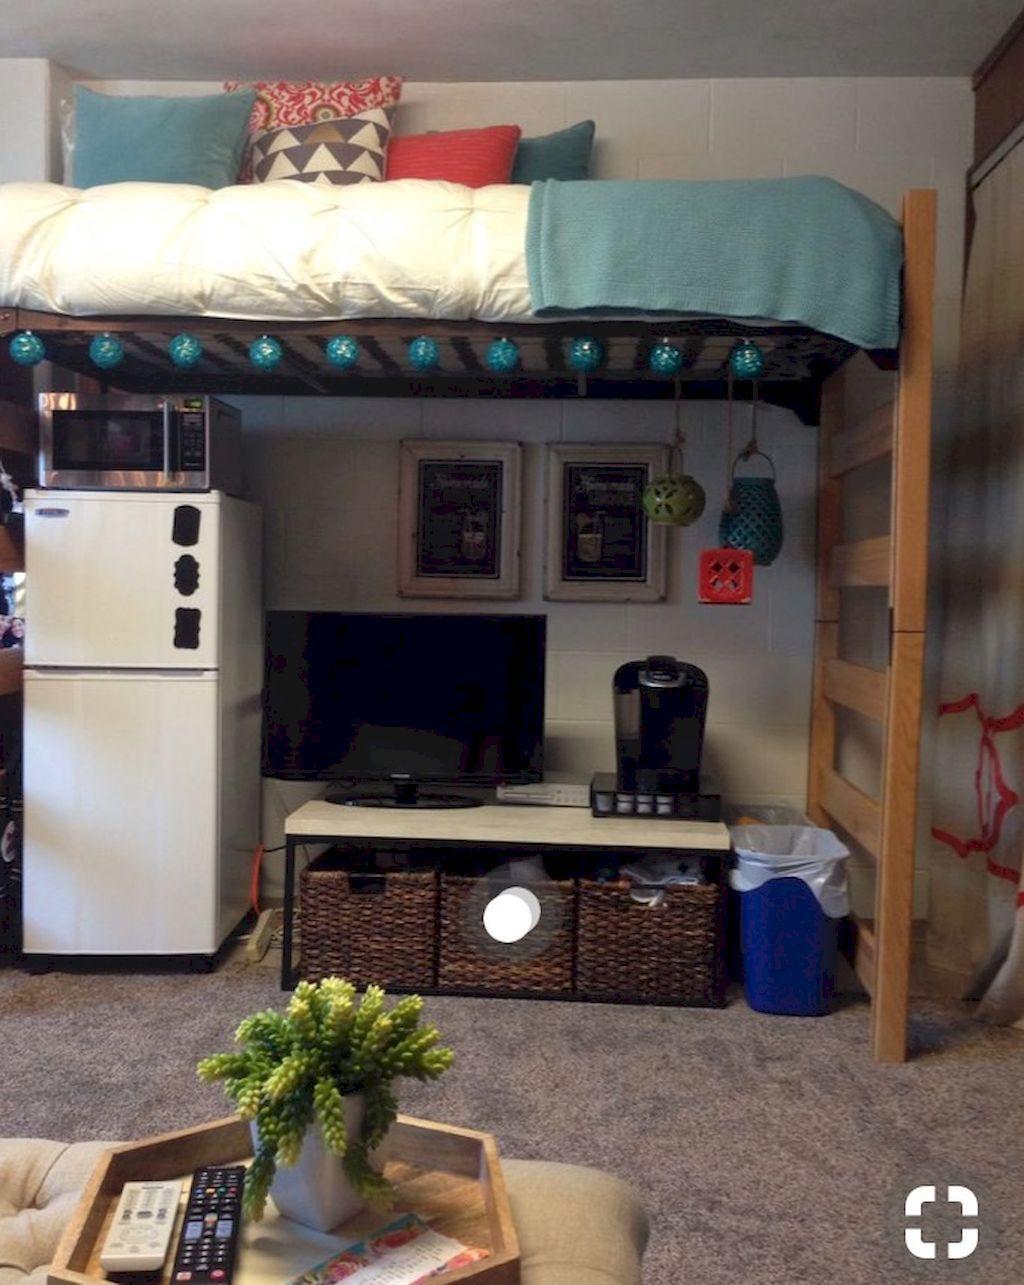 Cute loft bed ideas   Cute Loft Beds College Dorm Room Design Ideas For Girl  Dorm